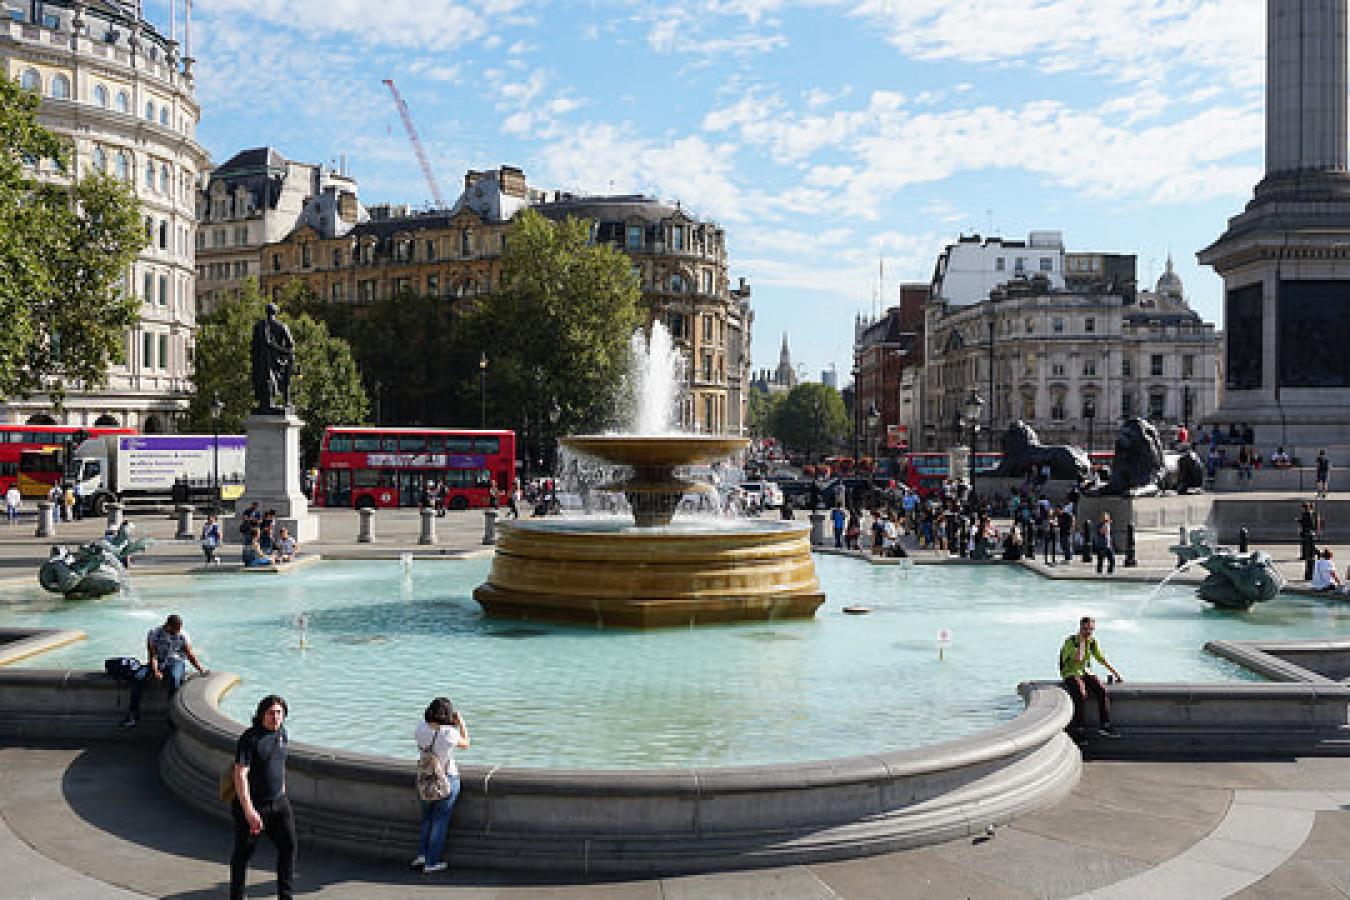 Trafalgar Square Fountain, London, UK